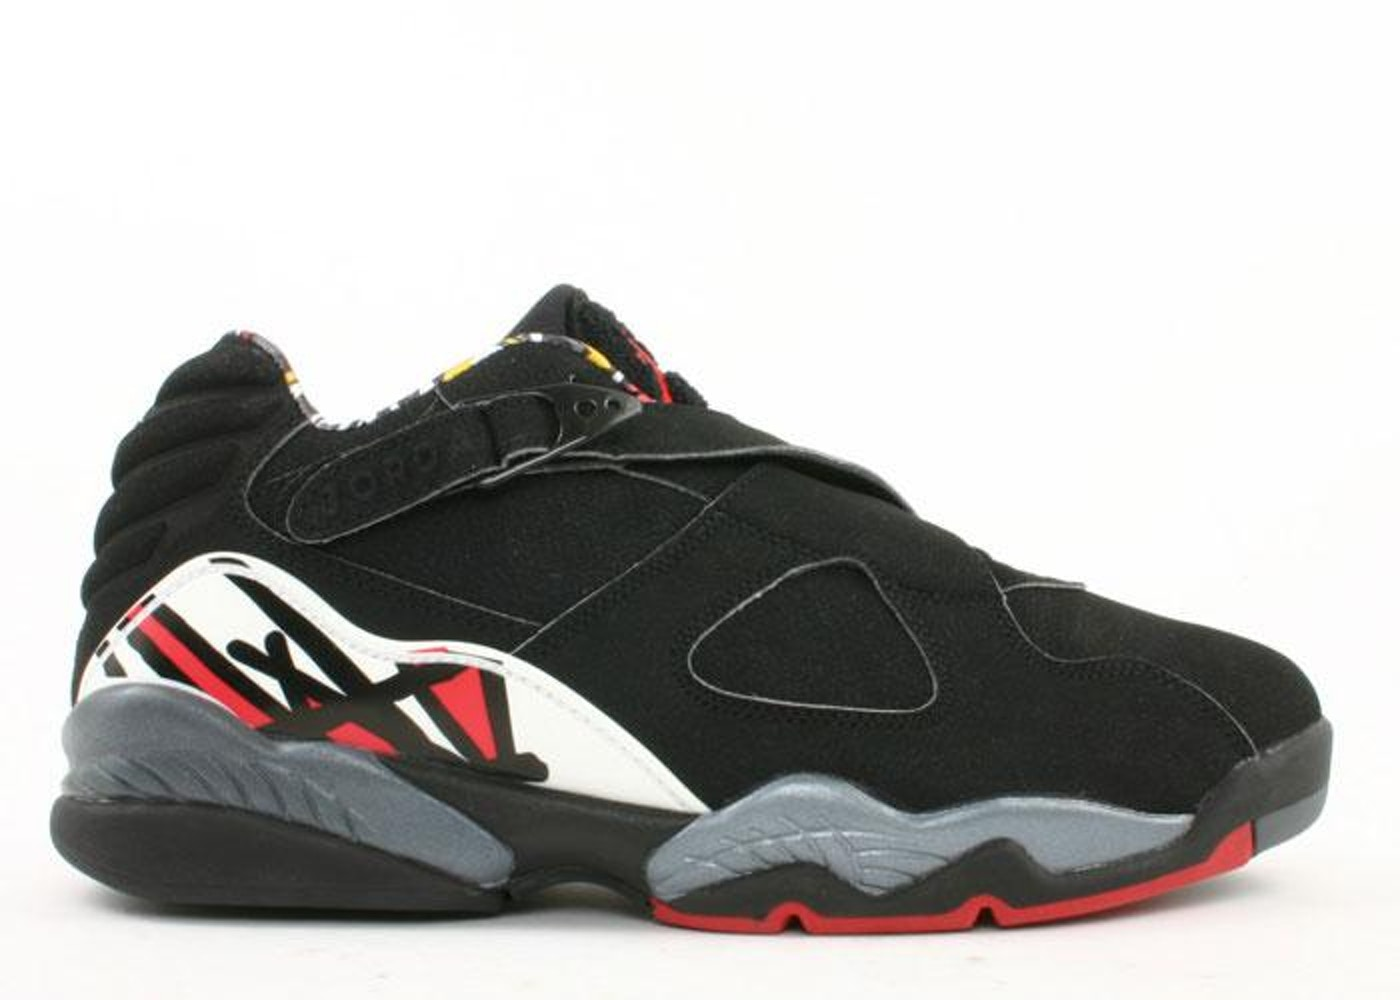 a64db799a83548 Jordan 8 Retro Low Playoffs (2003) - 306157-061